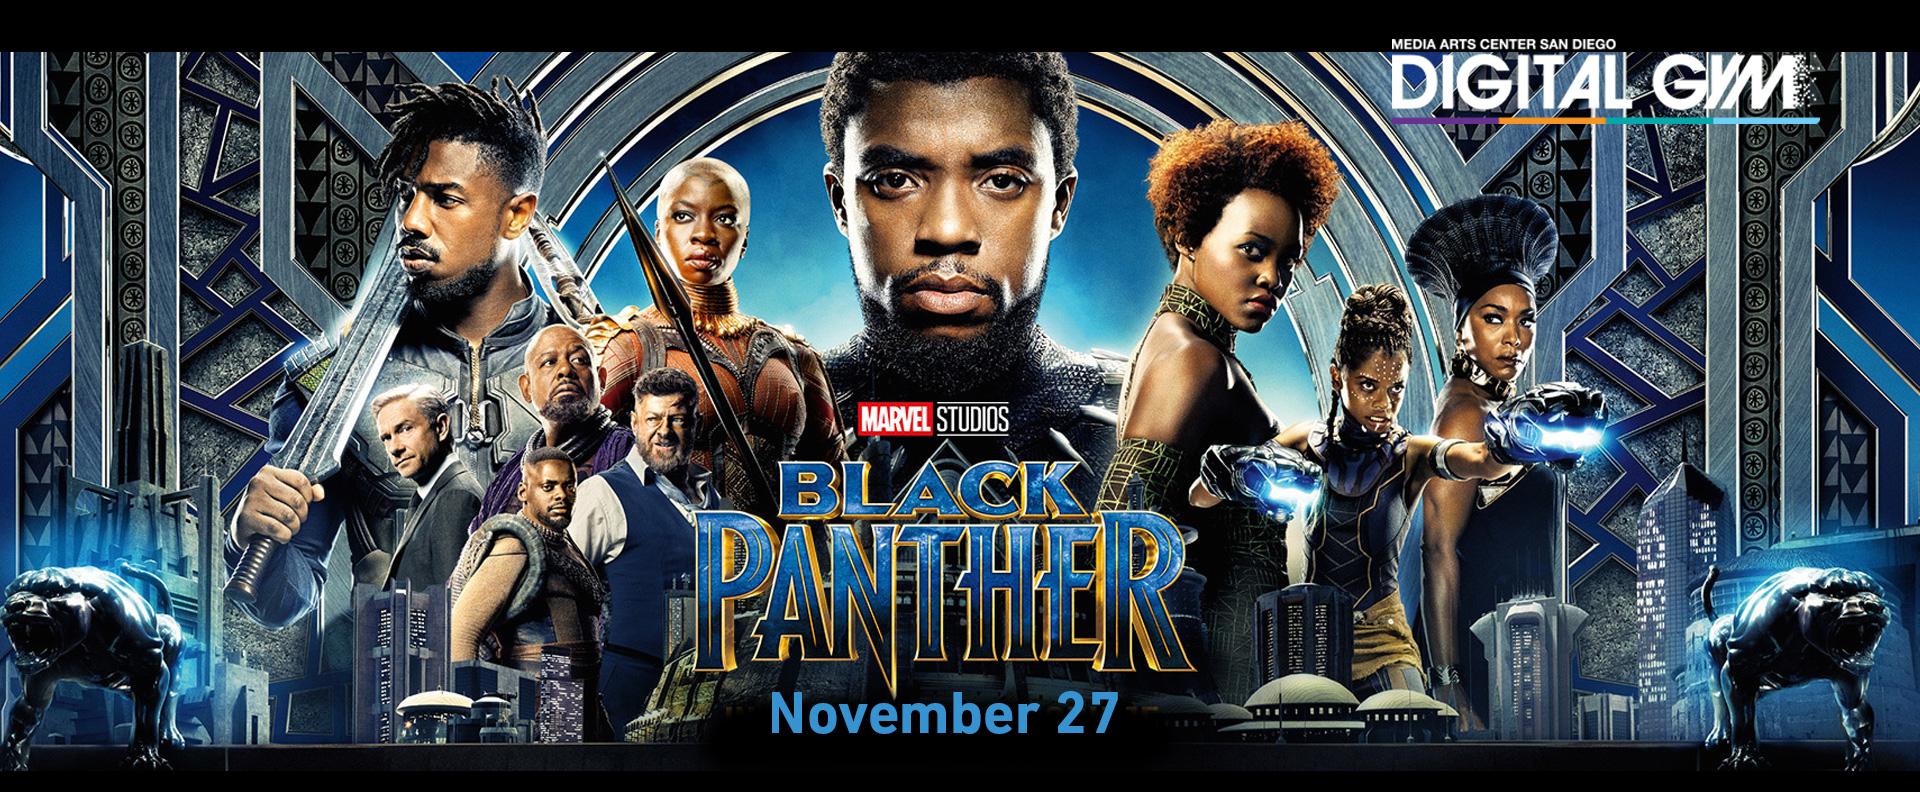 Black Panther free Digital Gym Cinema San Diego